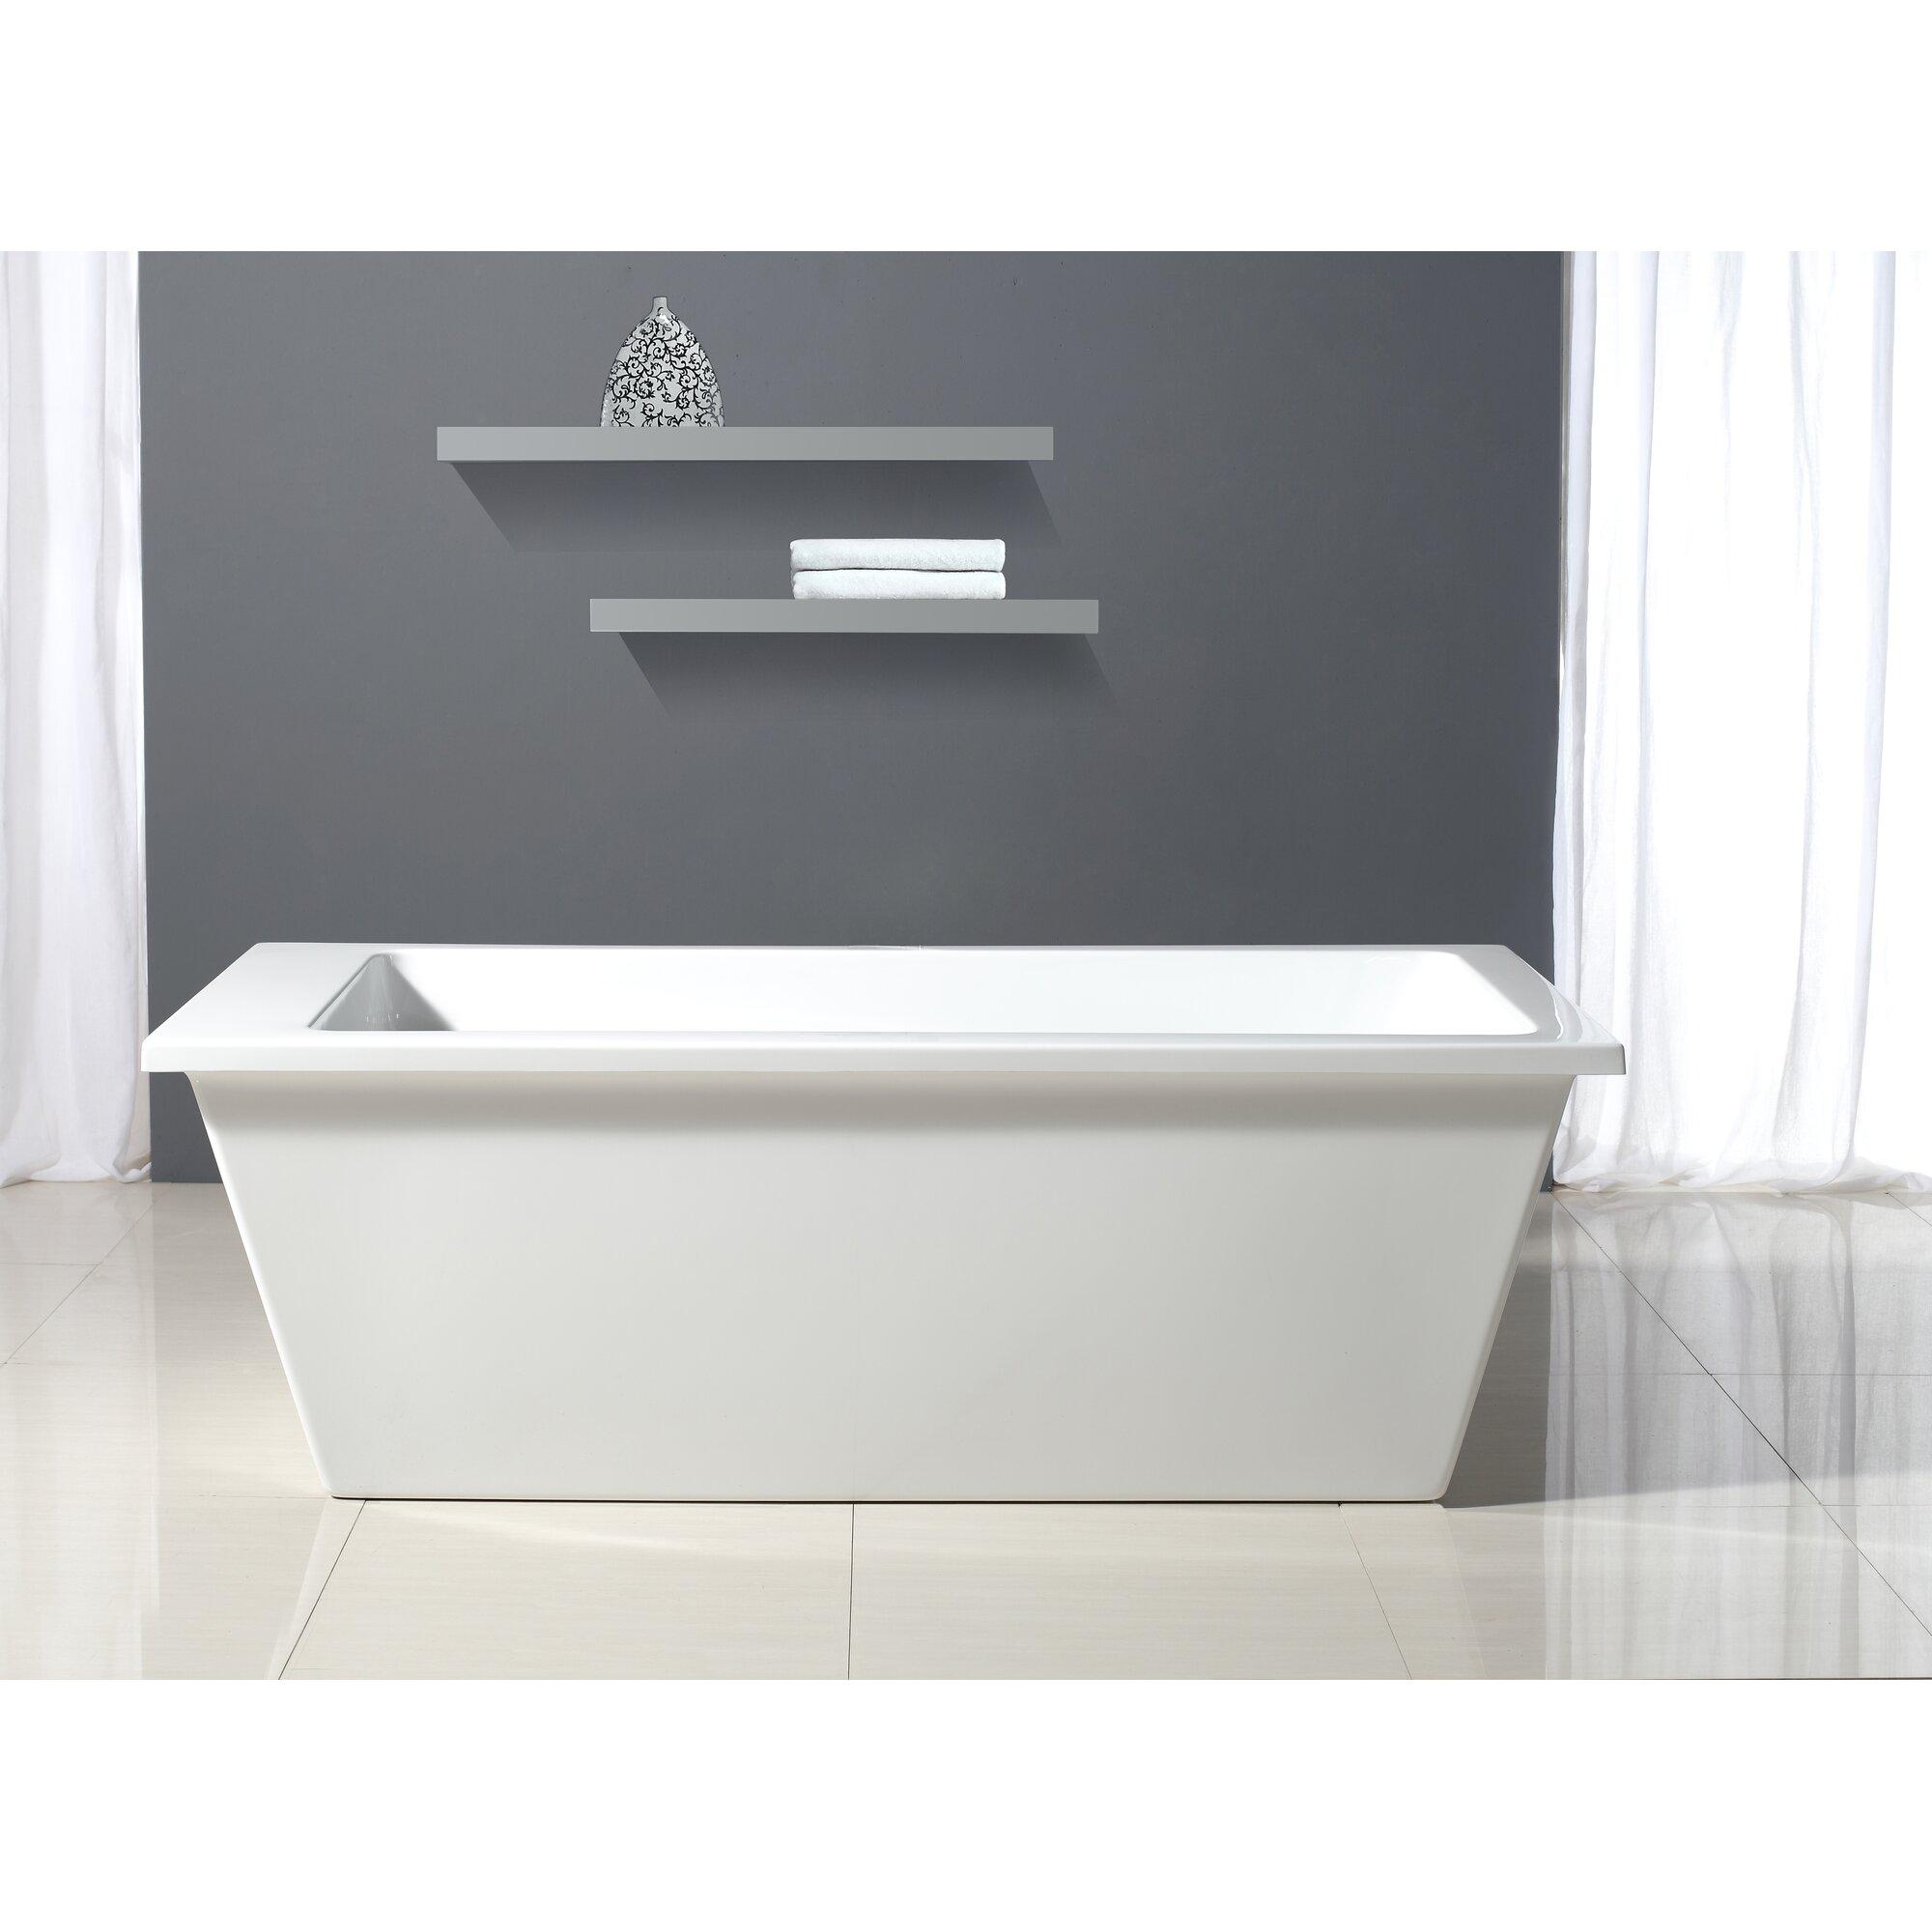 houston 69 x 31 bathtub - Ove Decors